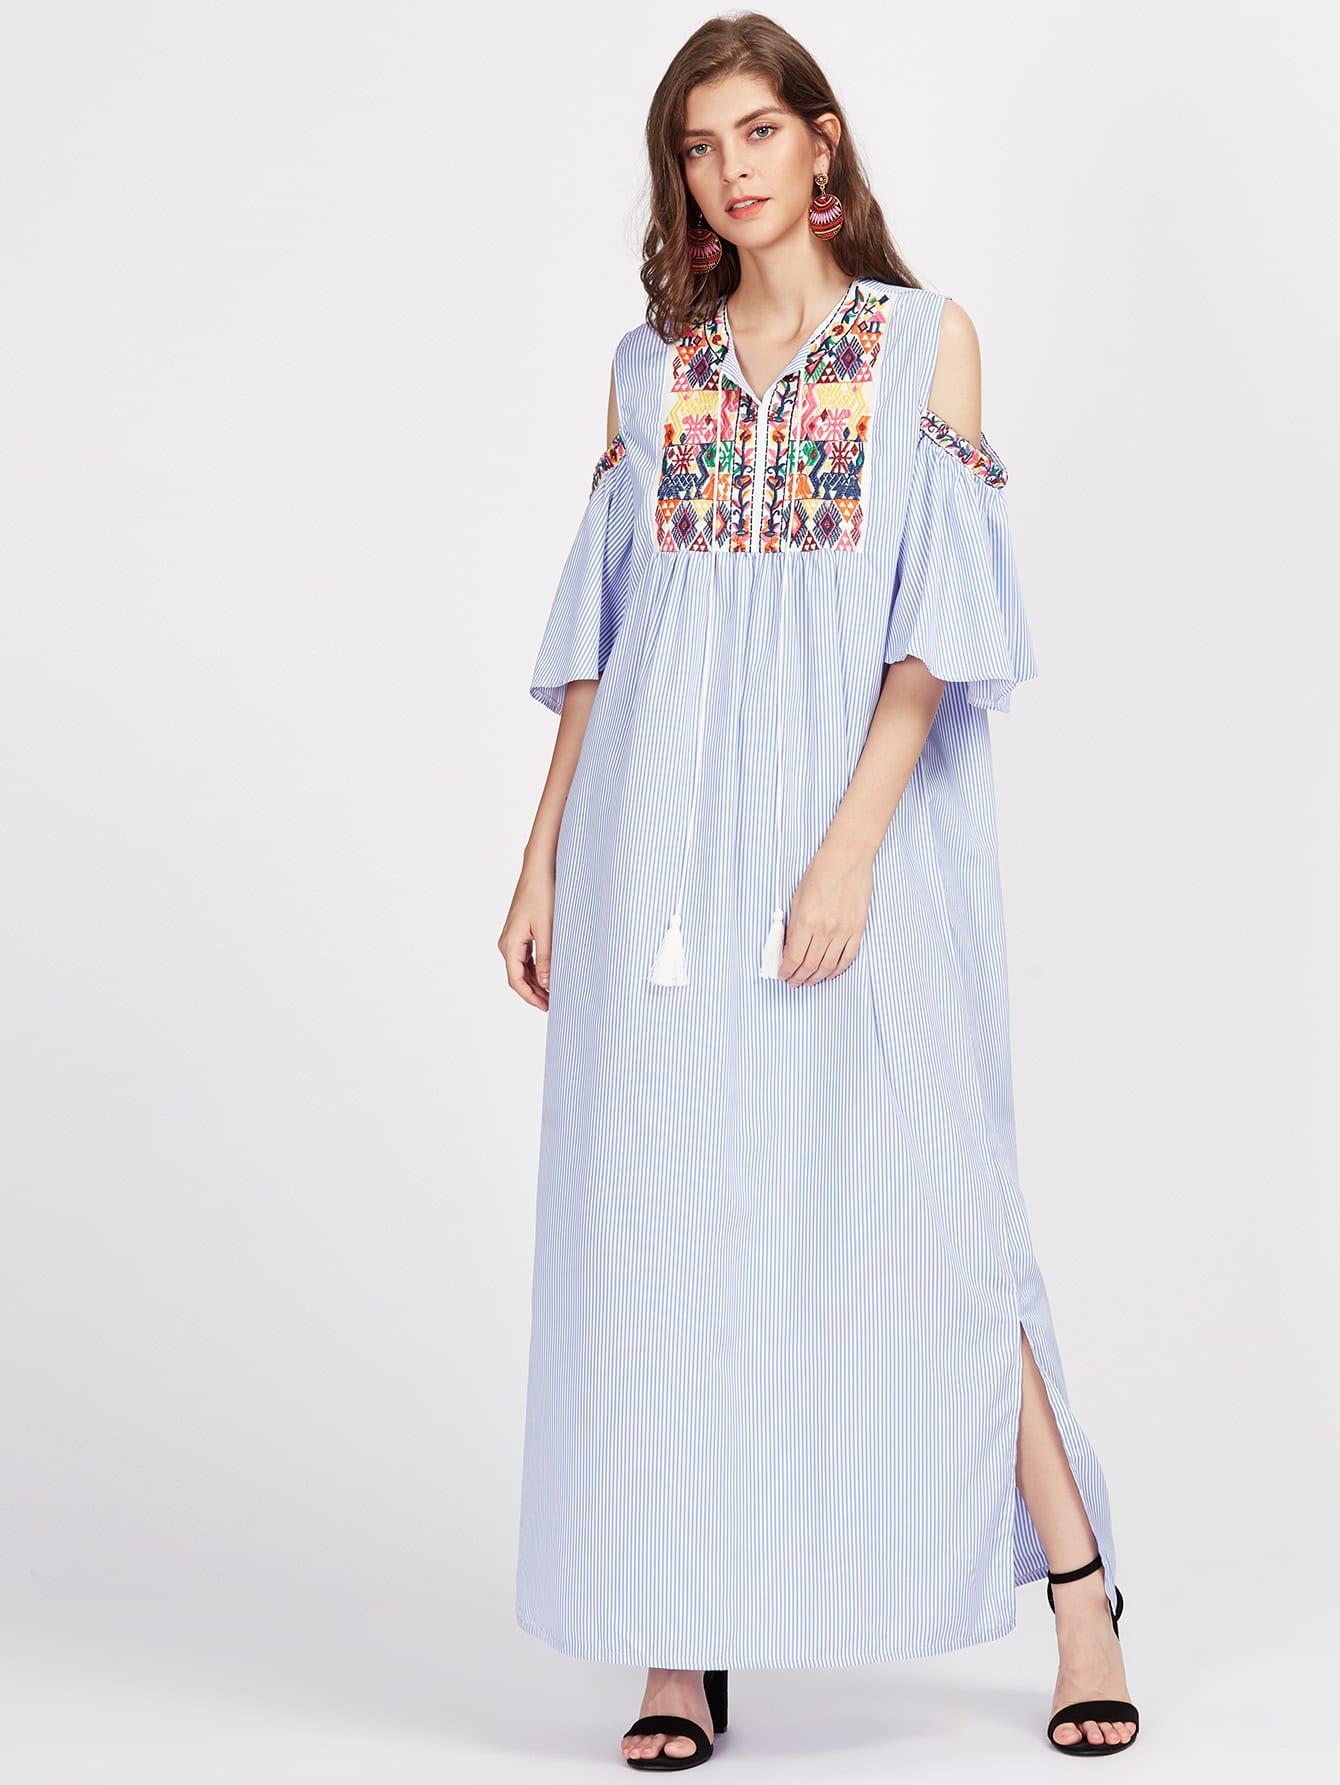 Aztec Embroidered Open Shoulder Tassel Tie Neck Pinstriped Dress dress170612002